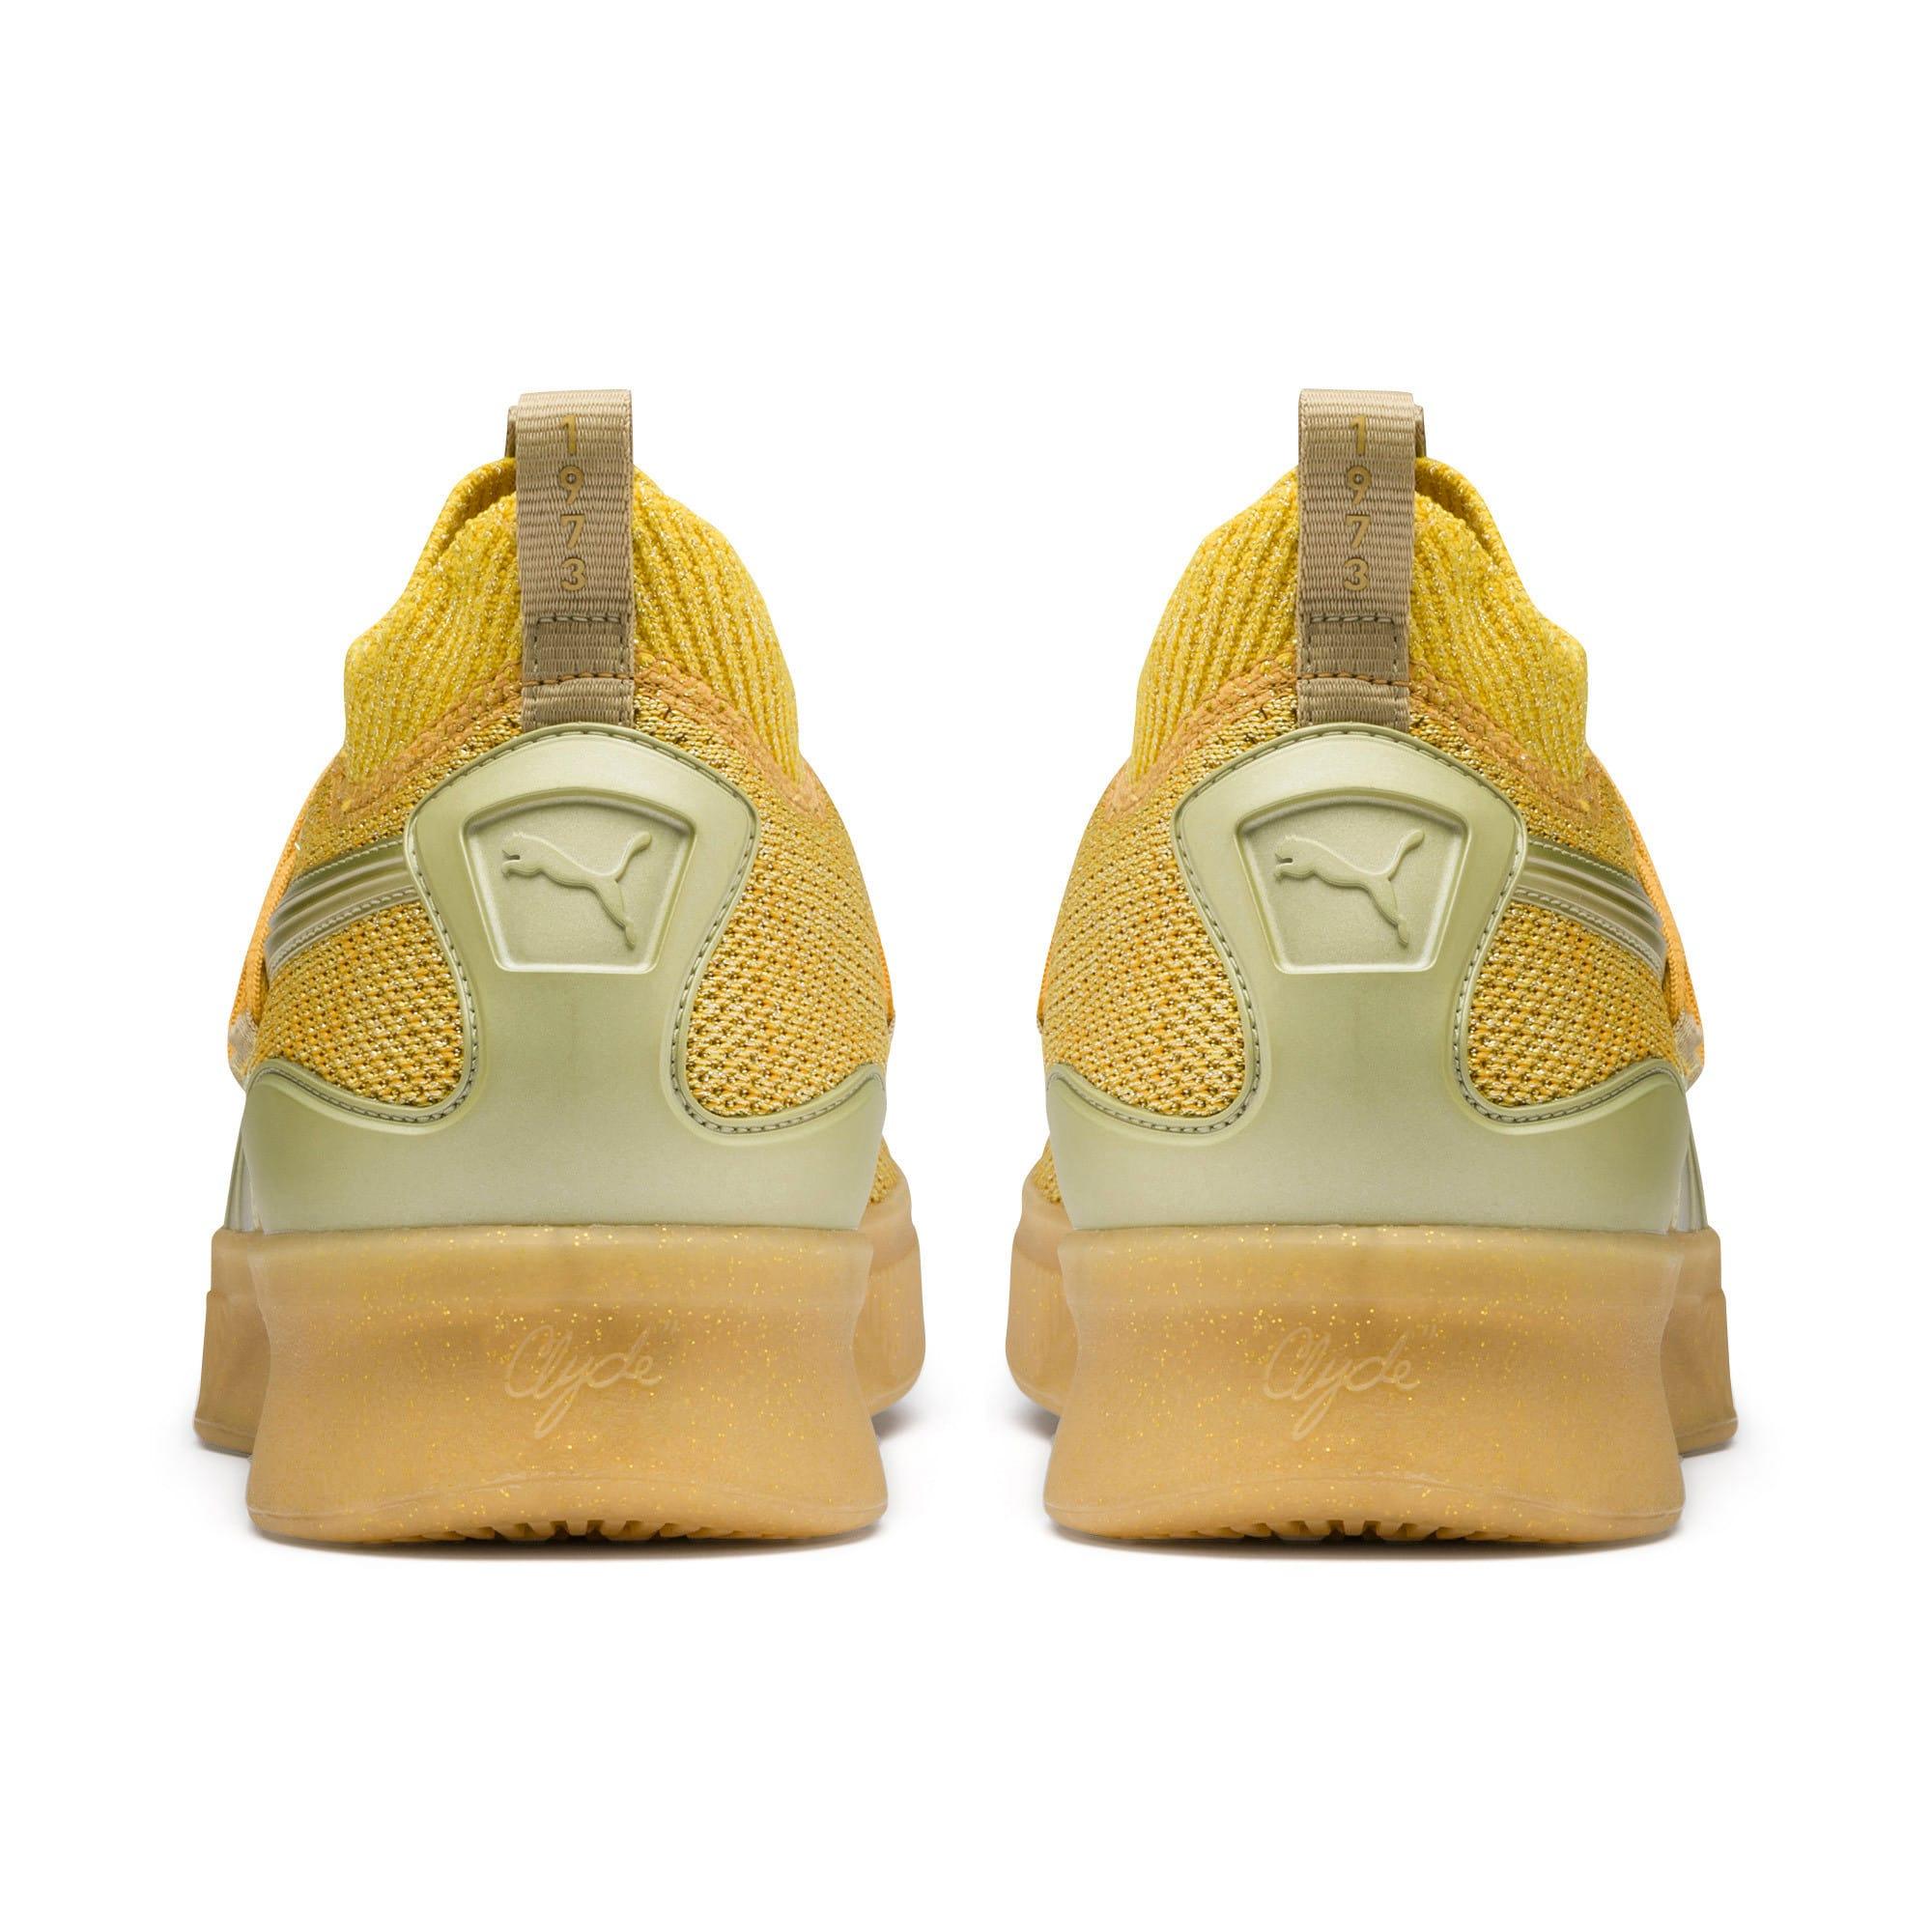 Thumbnail 3 of Clyde Court Title Run Basketball Shoes, Metallic Gold, medium